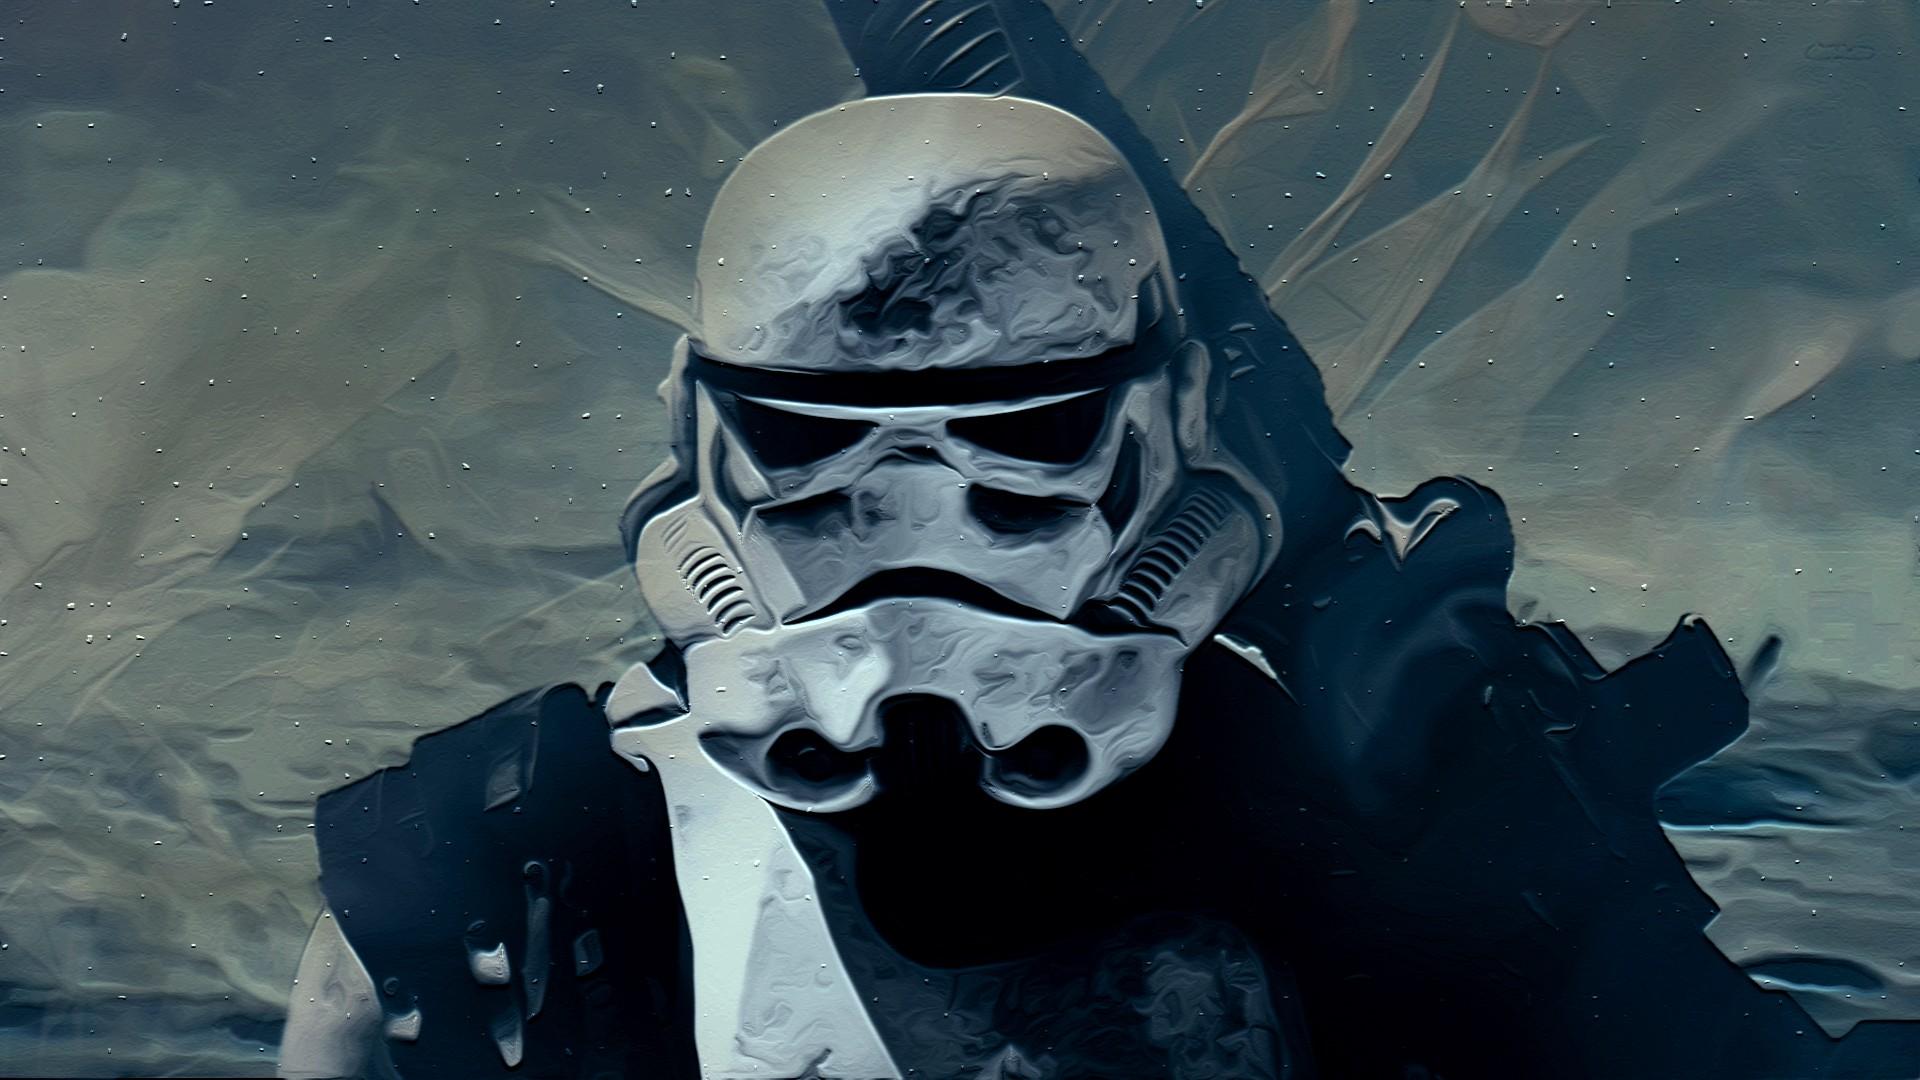 Download 1920x1080 Wallpaper Stormtrooper From Star Wars Full Hd